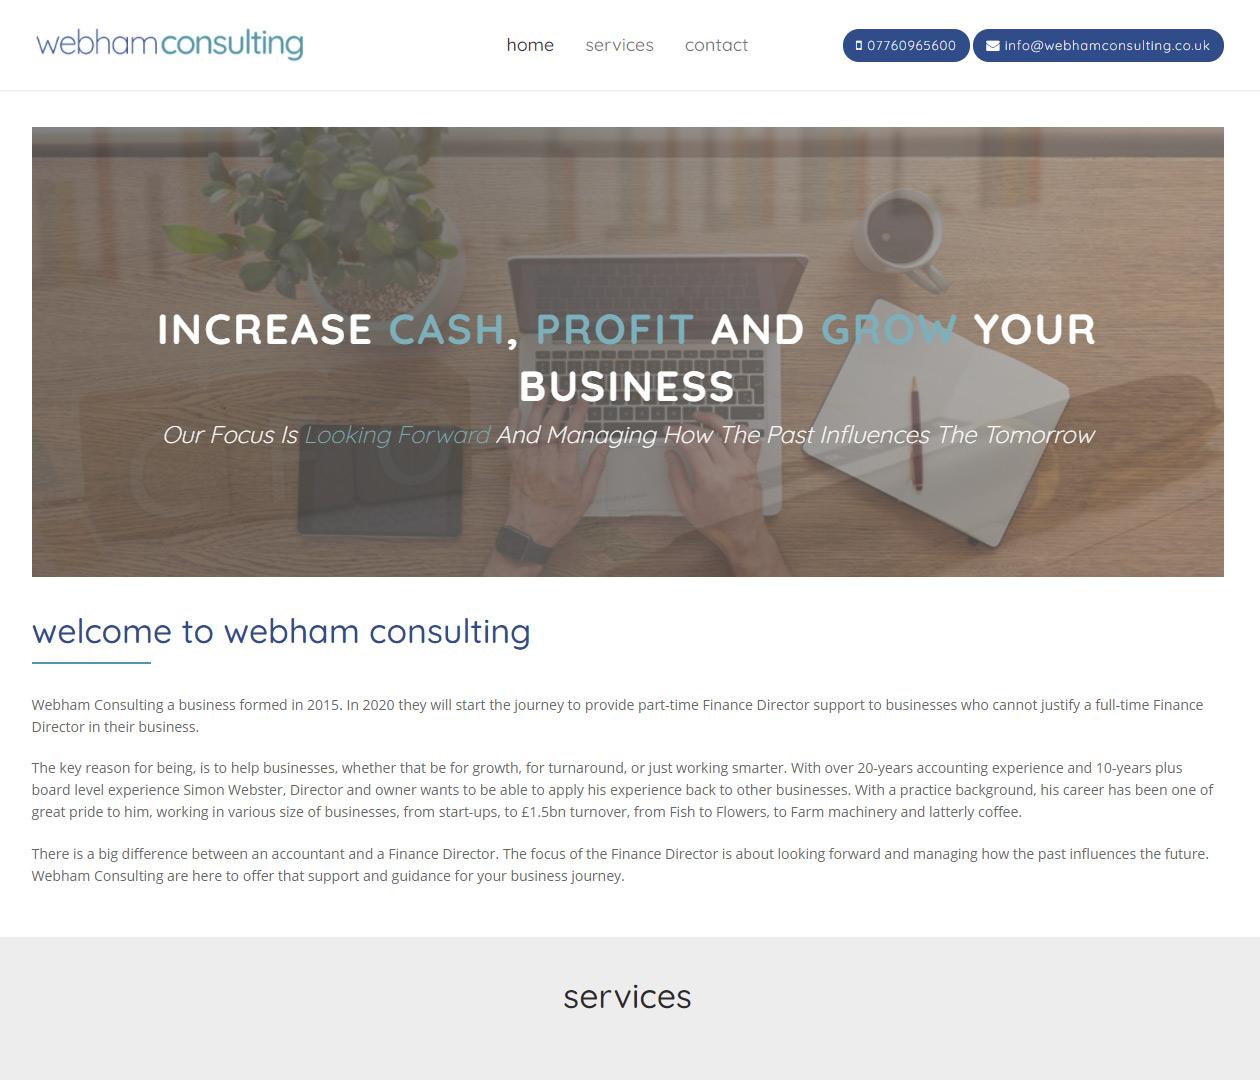 Webham Consulting